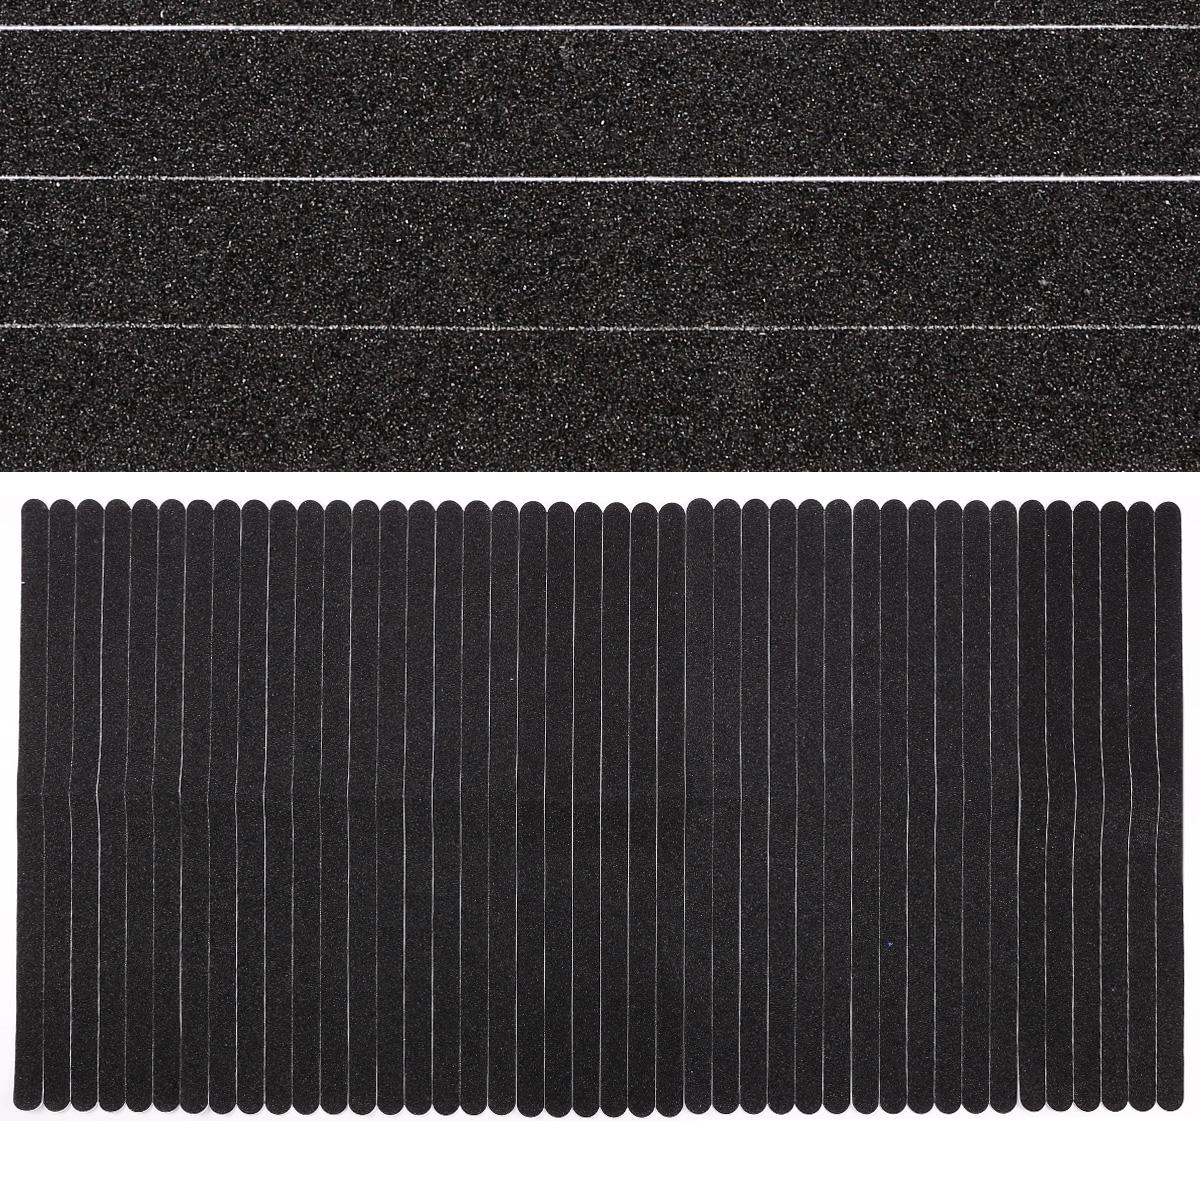 Anti Slip Floor Strips : Pieces anti slip bath floor grip stickers non